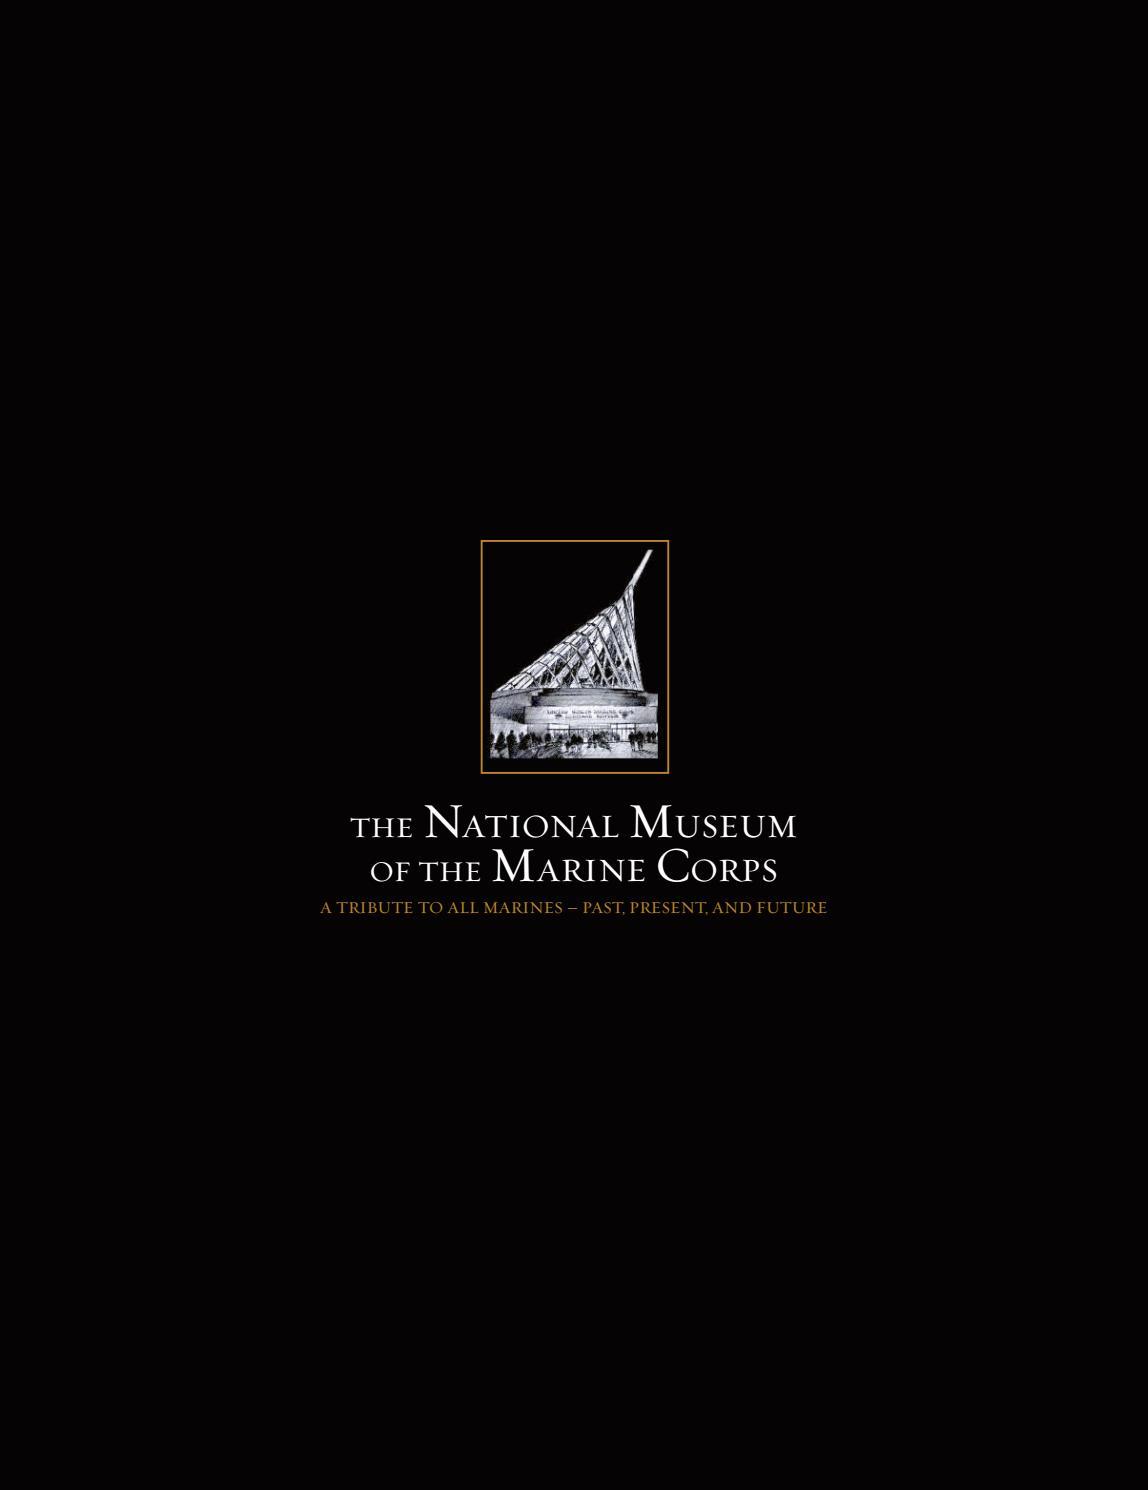 7.62 DESIGN USMC MARINES POWER GLORY BATTLESPACE T-SHIRT ARMY RESPECT TOP BLACK